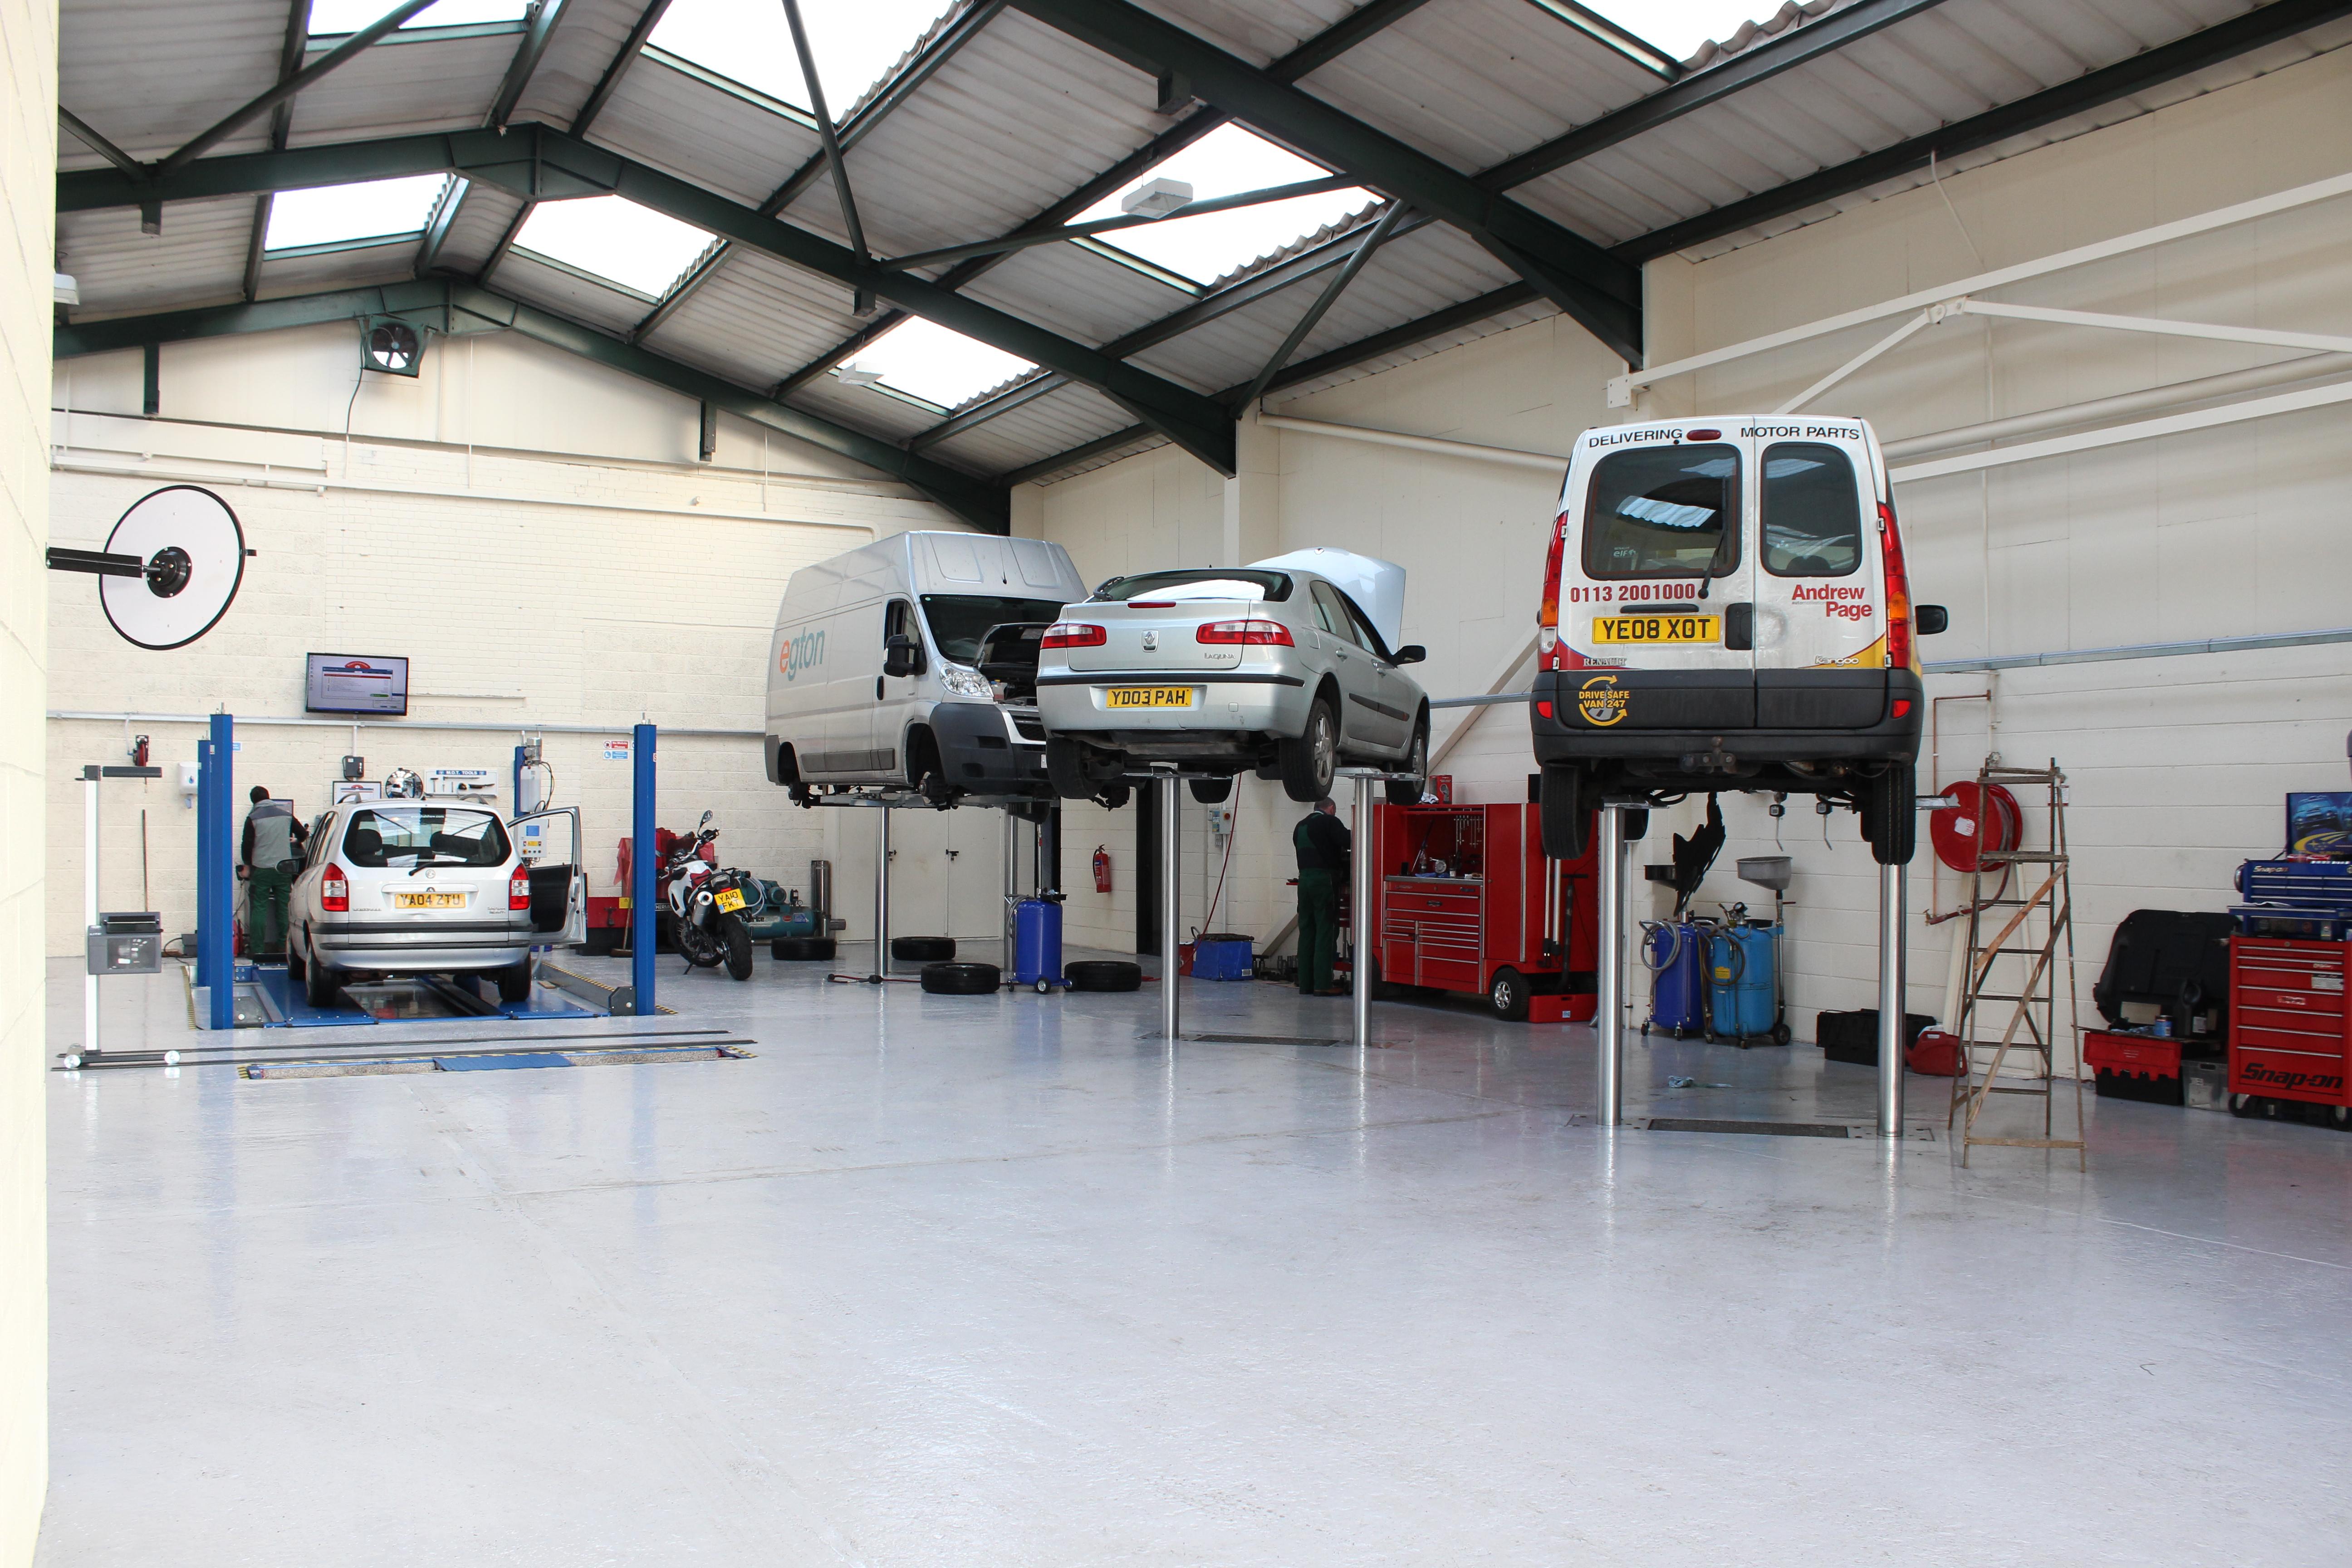 M Amp J Auto Repairs Garage Services Leeds Car Servicing